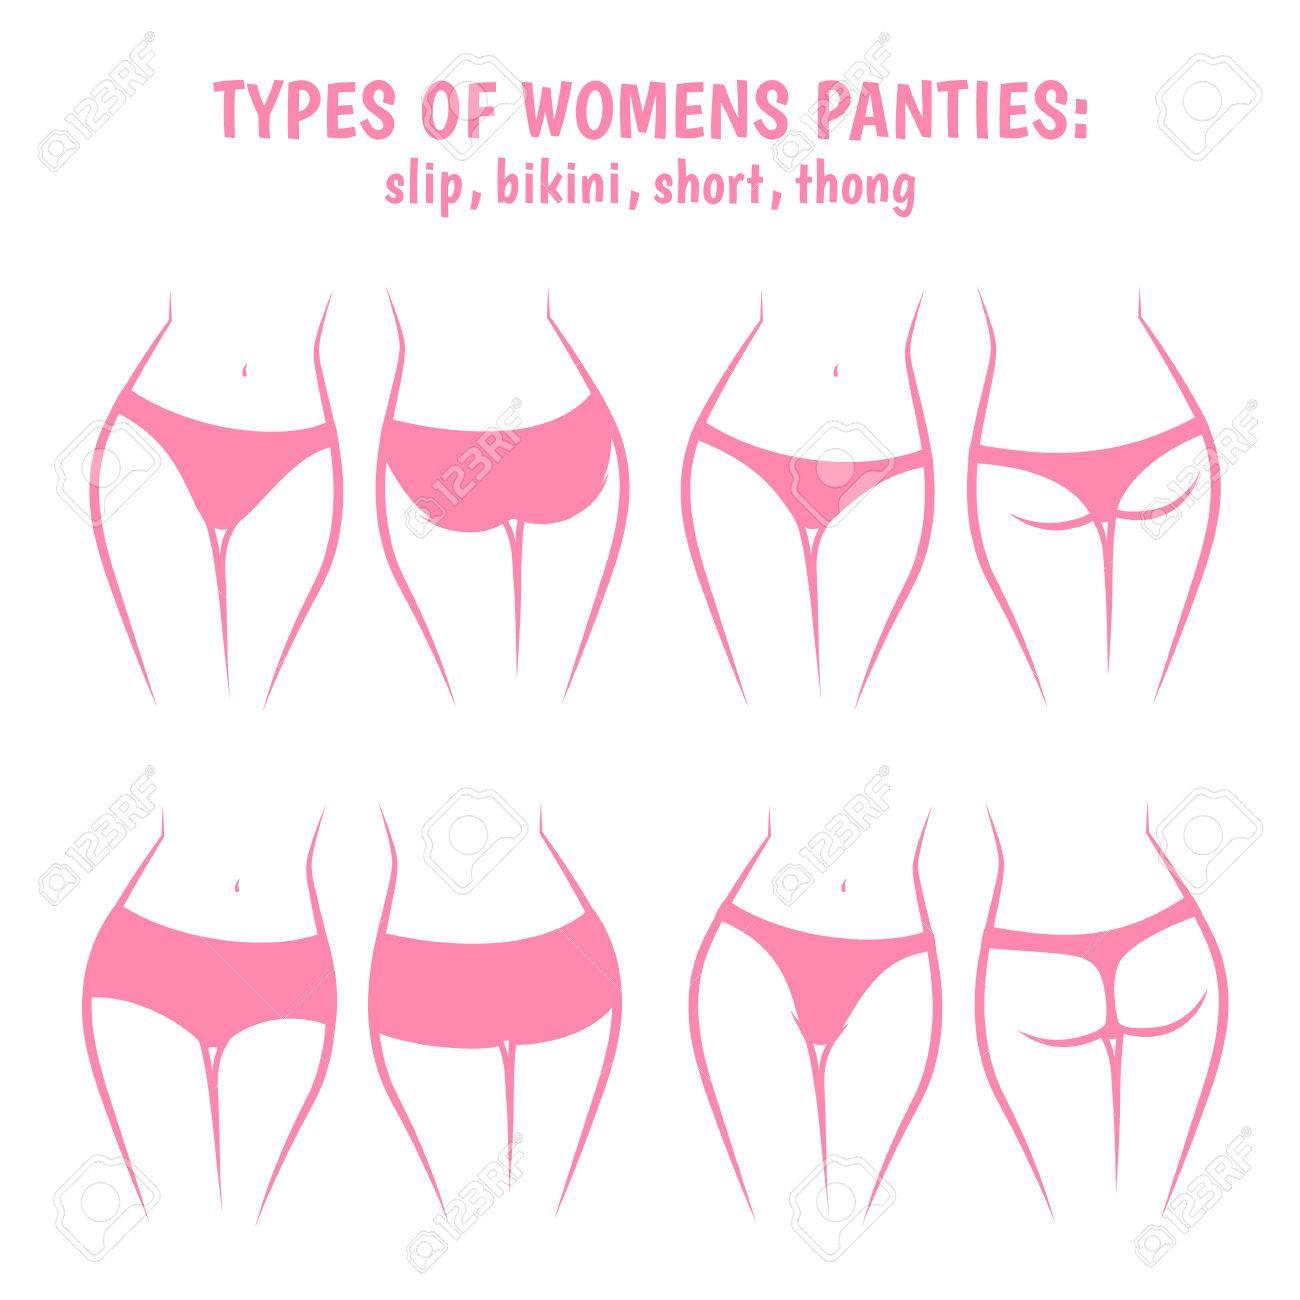 Various women panties, underpants views front and rear - 51630076